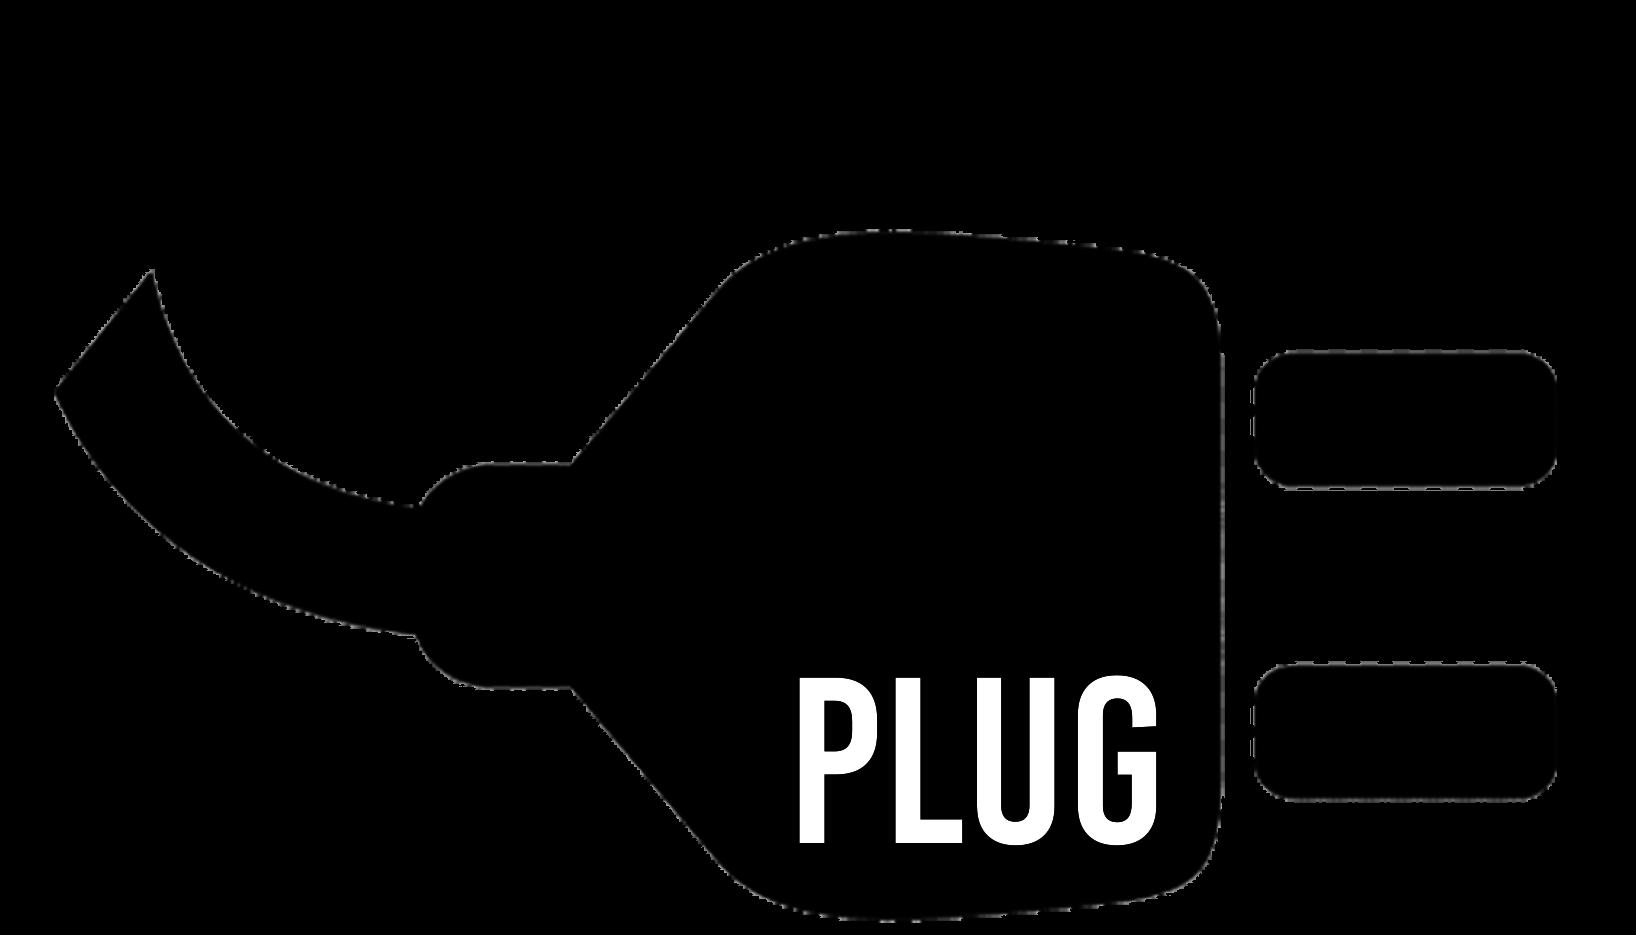 The Product Plug